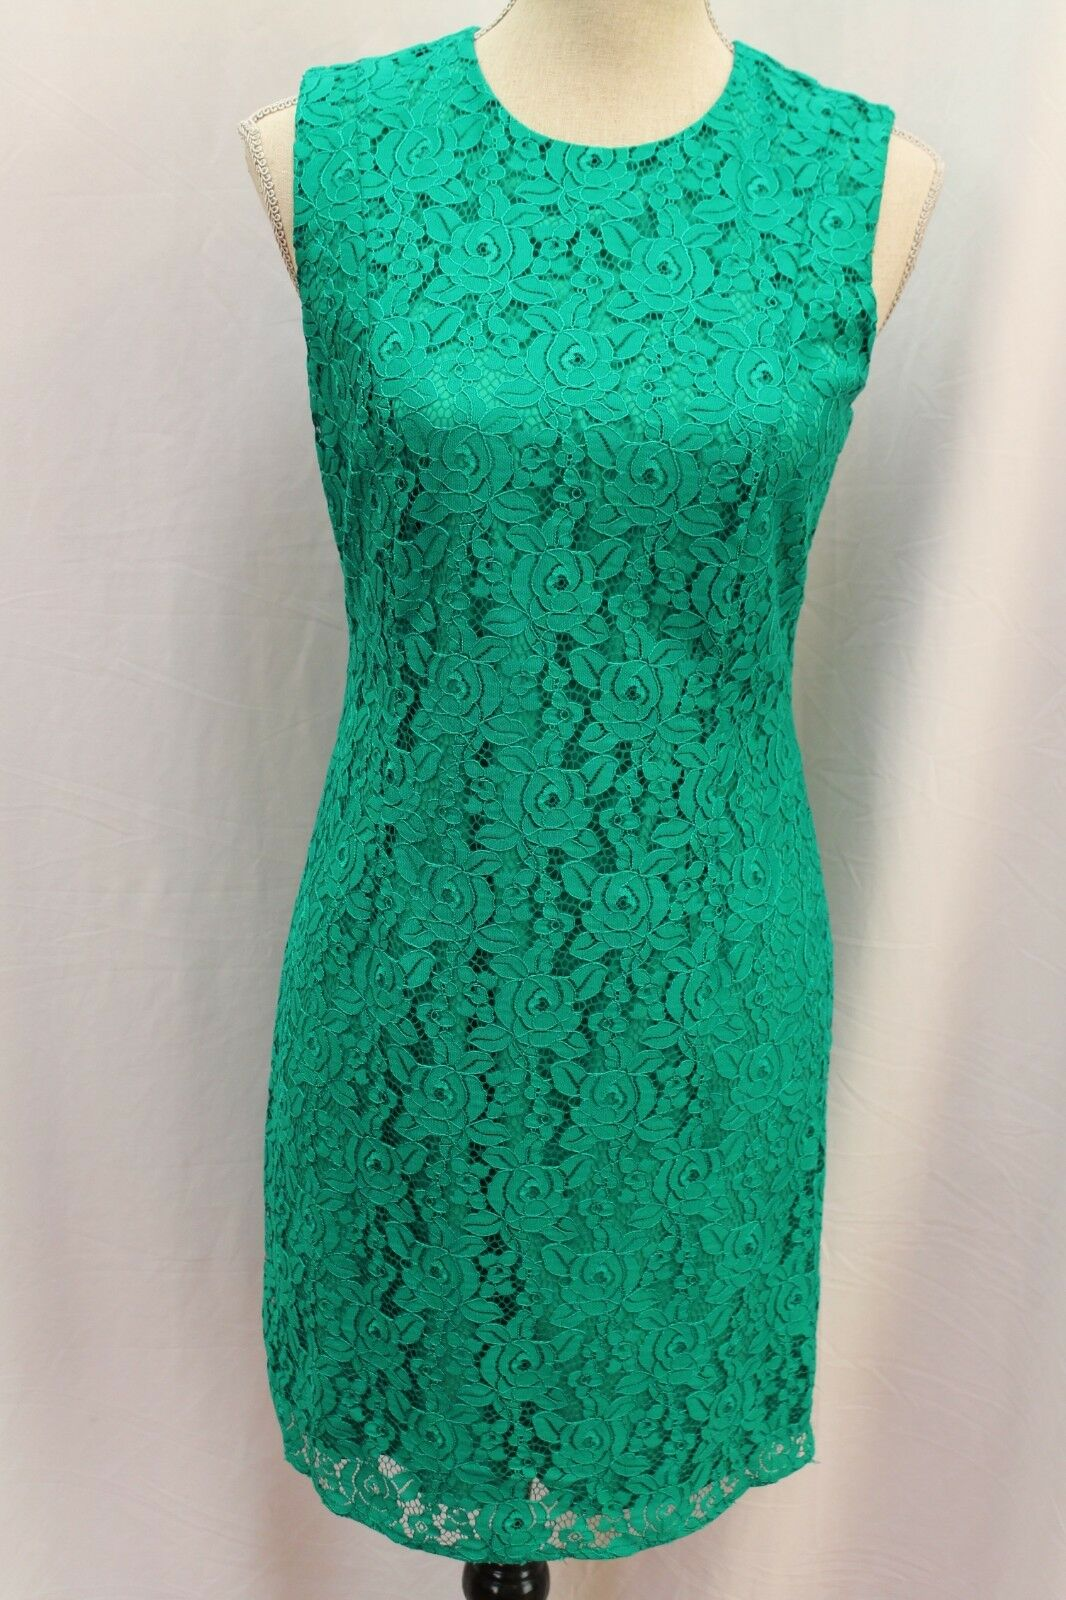 NEW Diane von Furstenberg DVF Tailored Lace Green Evergreen Dress 4 S Small  448